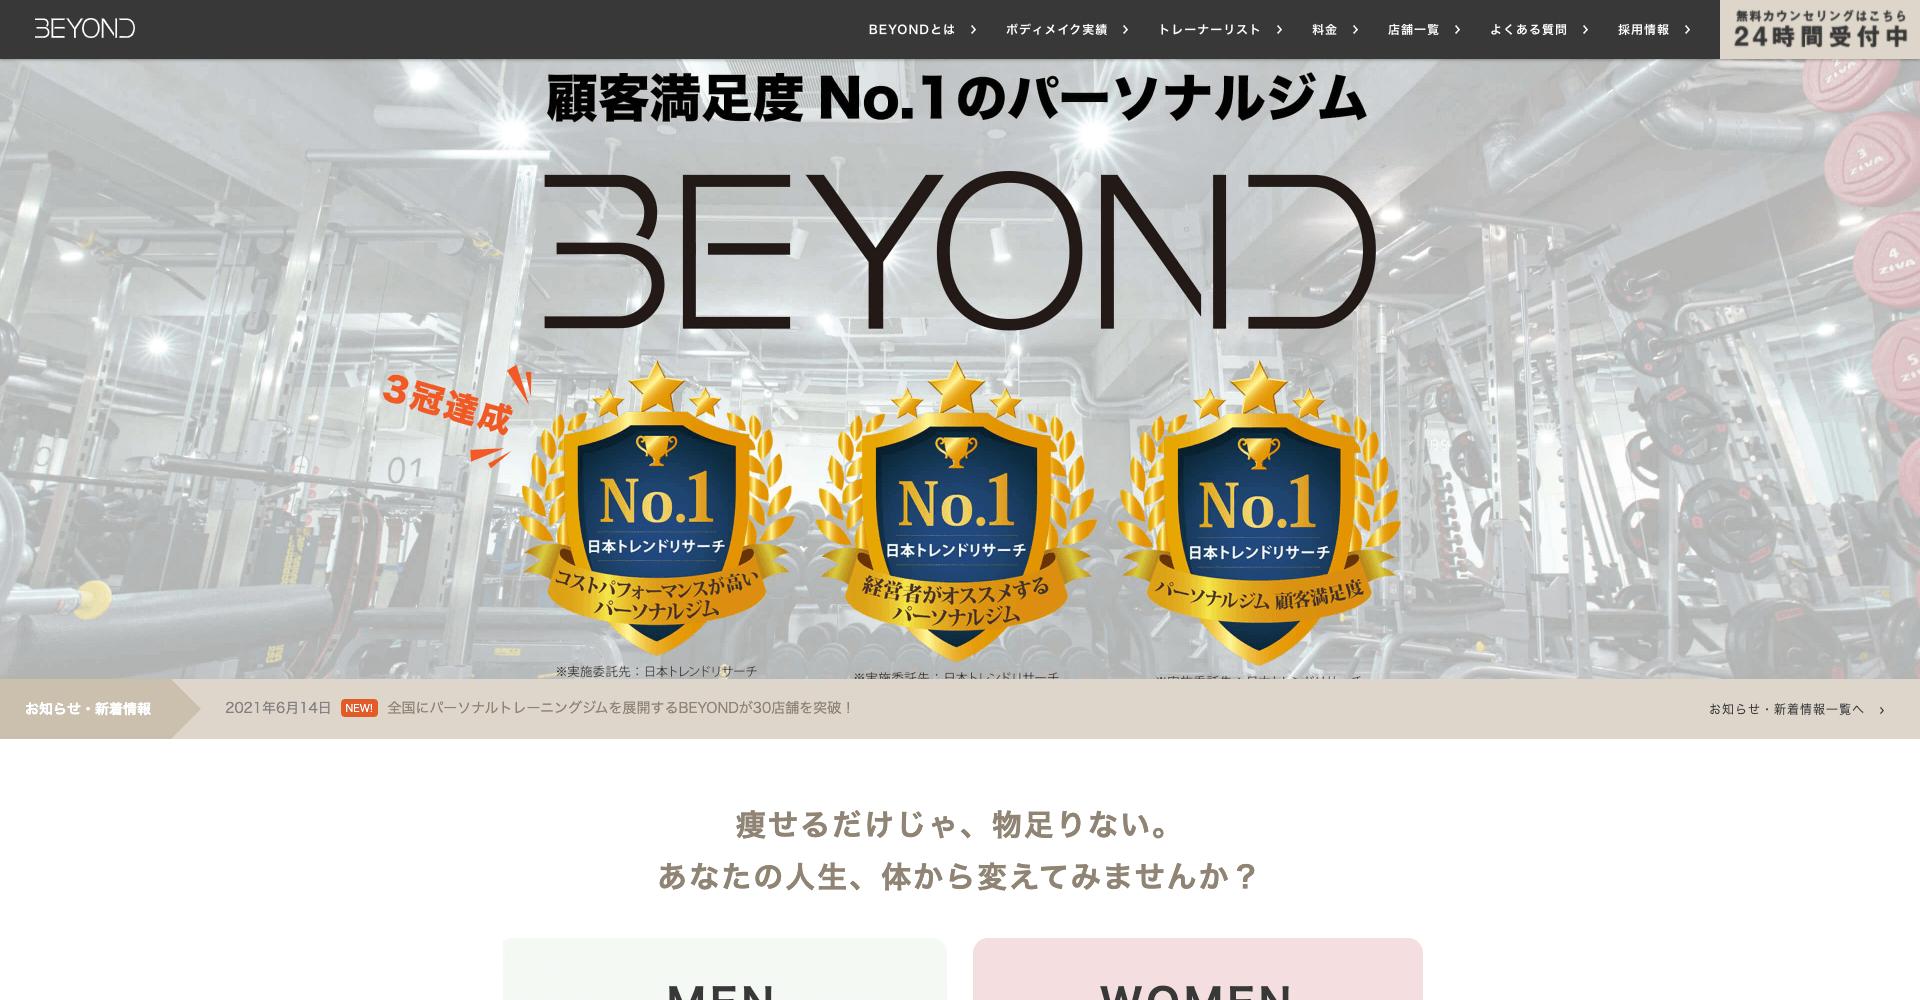 BEYOND(ビヨンド)ジム 新宿店